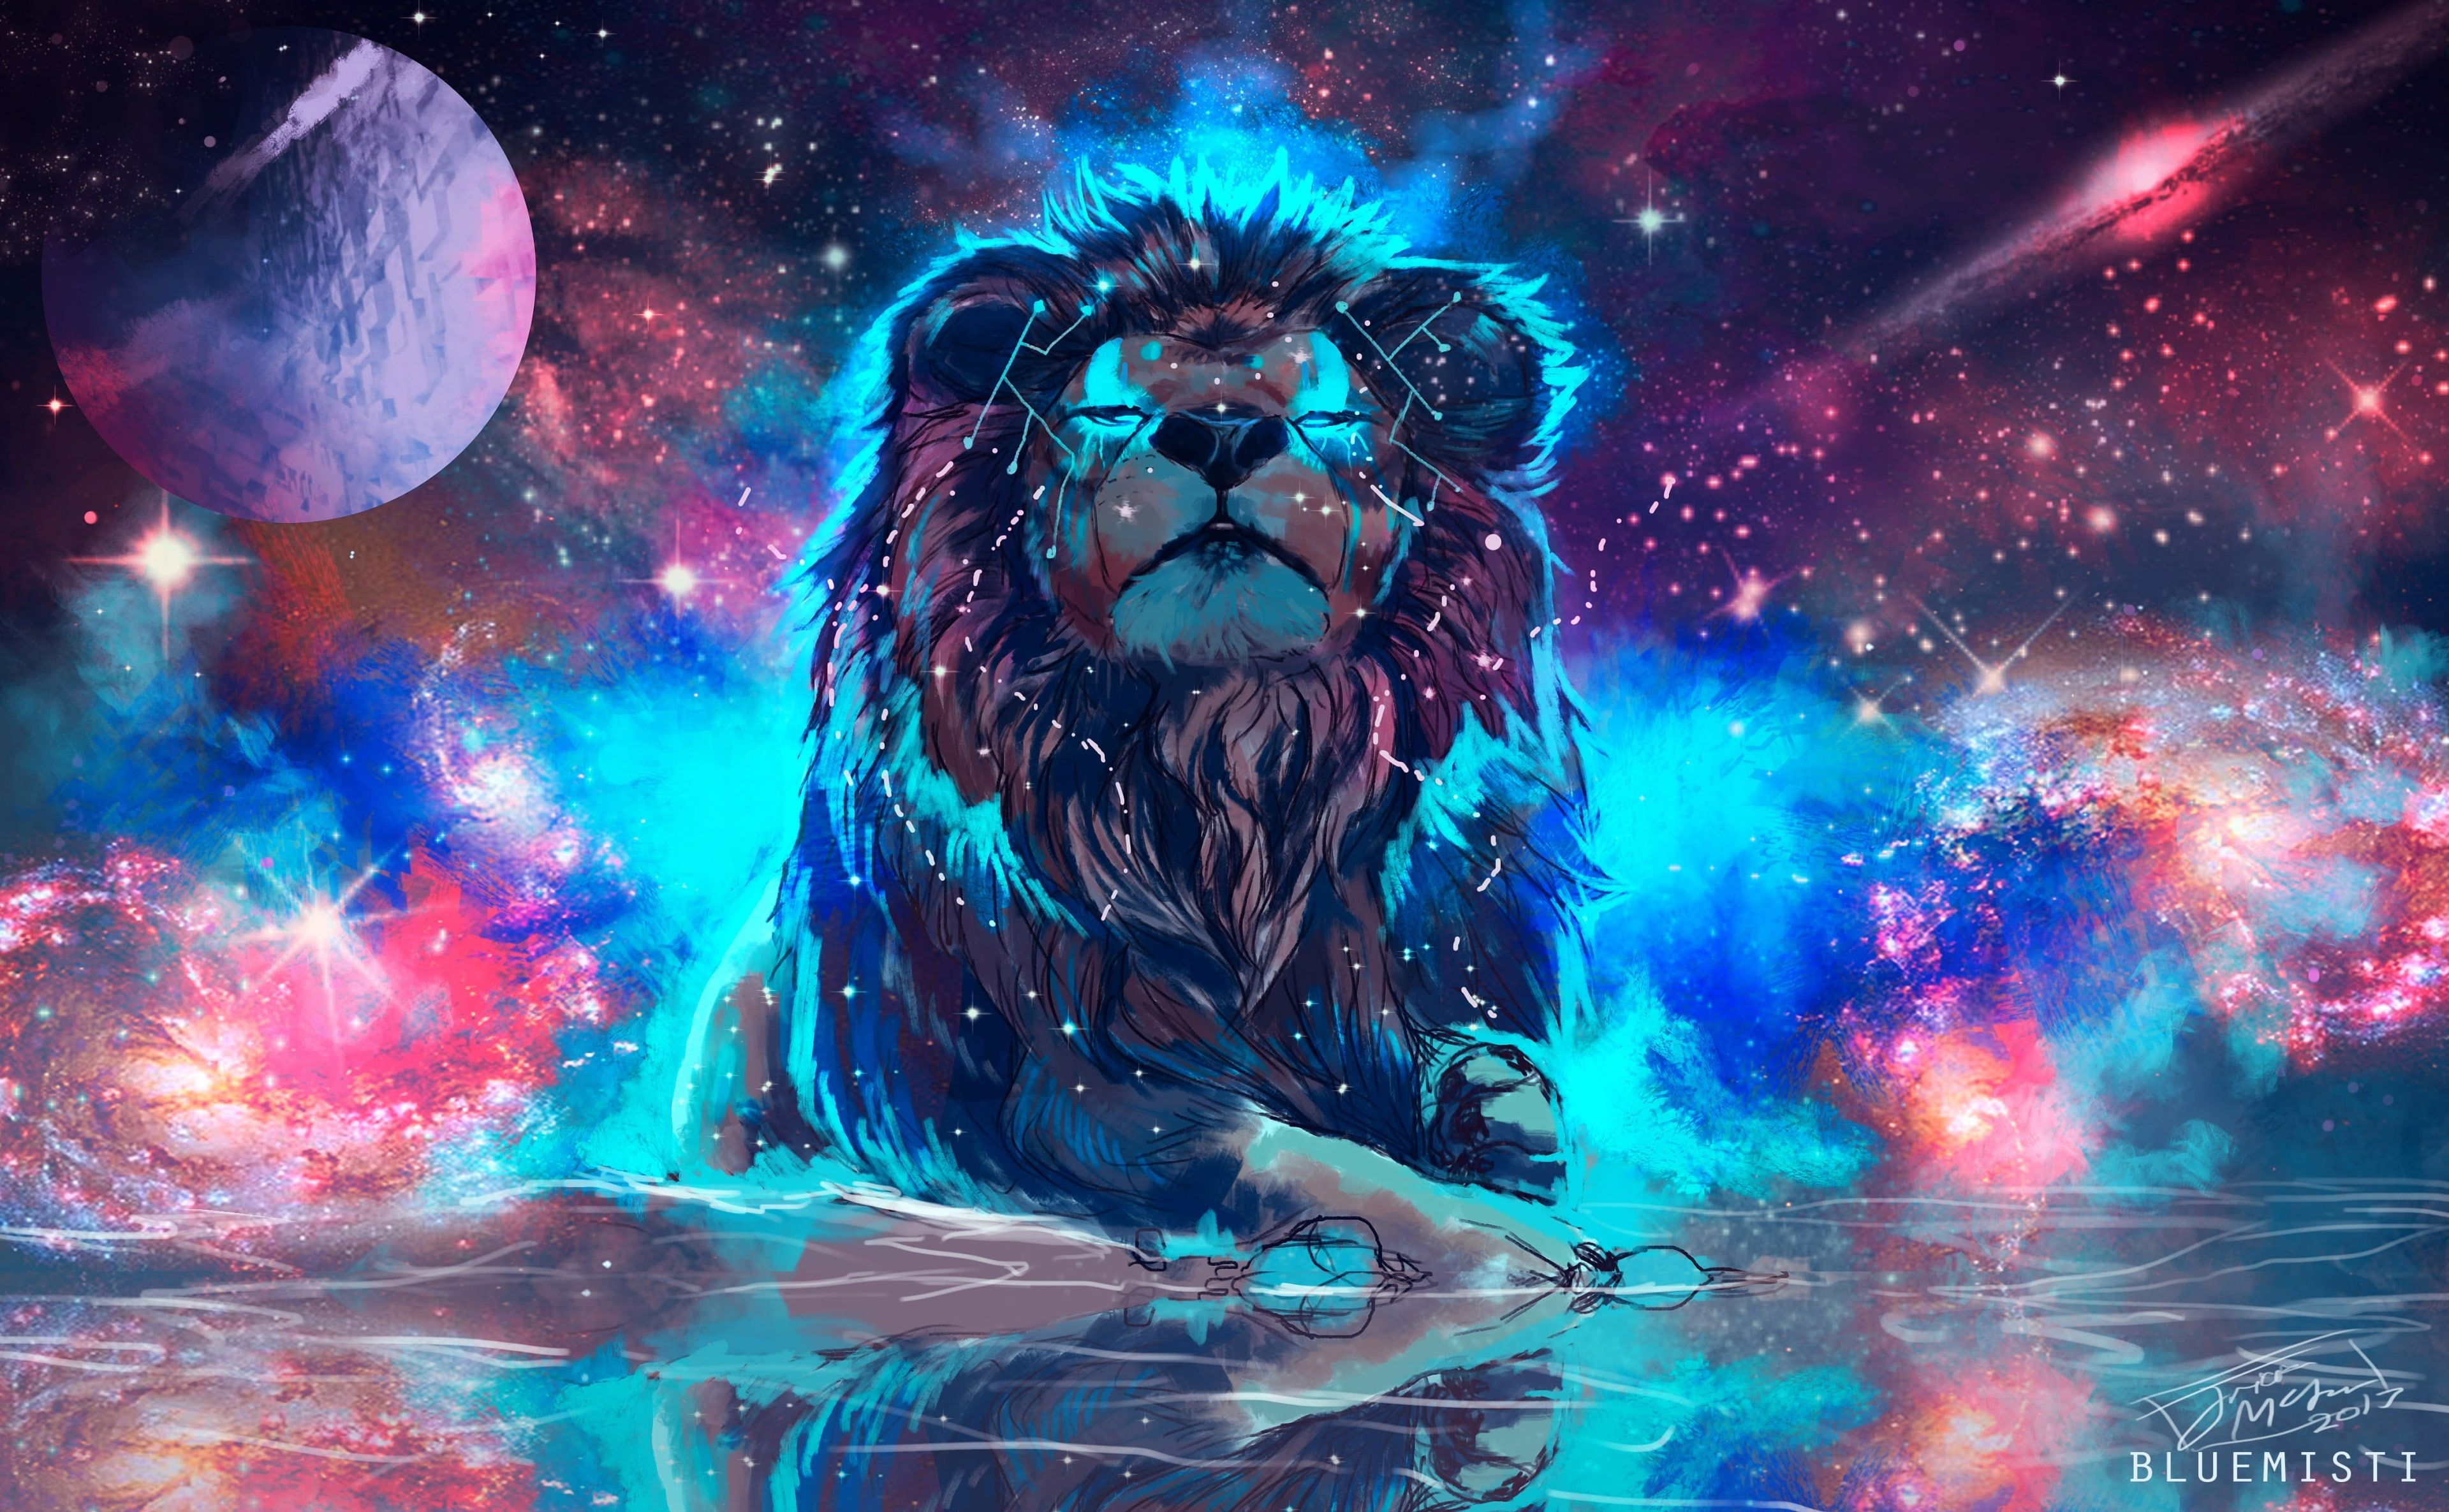 Lion 4k Hd Image Download 4k Wallpaper Hdwallpaper Desktop Colorful Lion Lion Wallpaper Lion Art